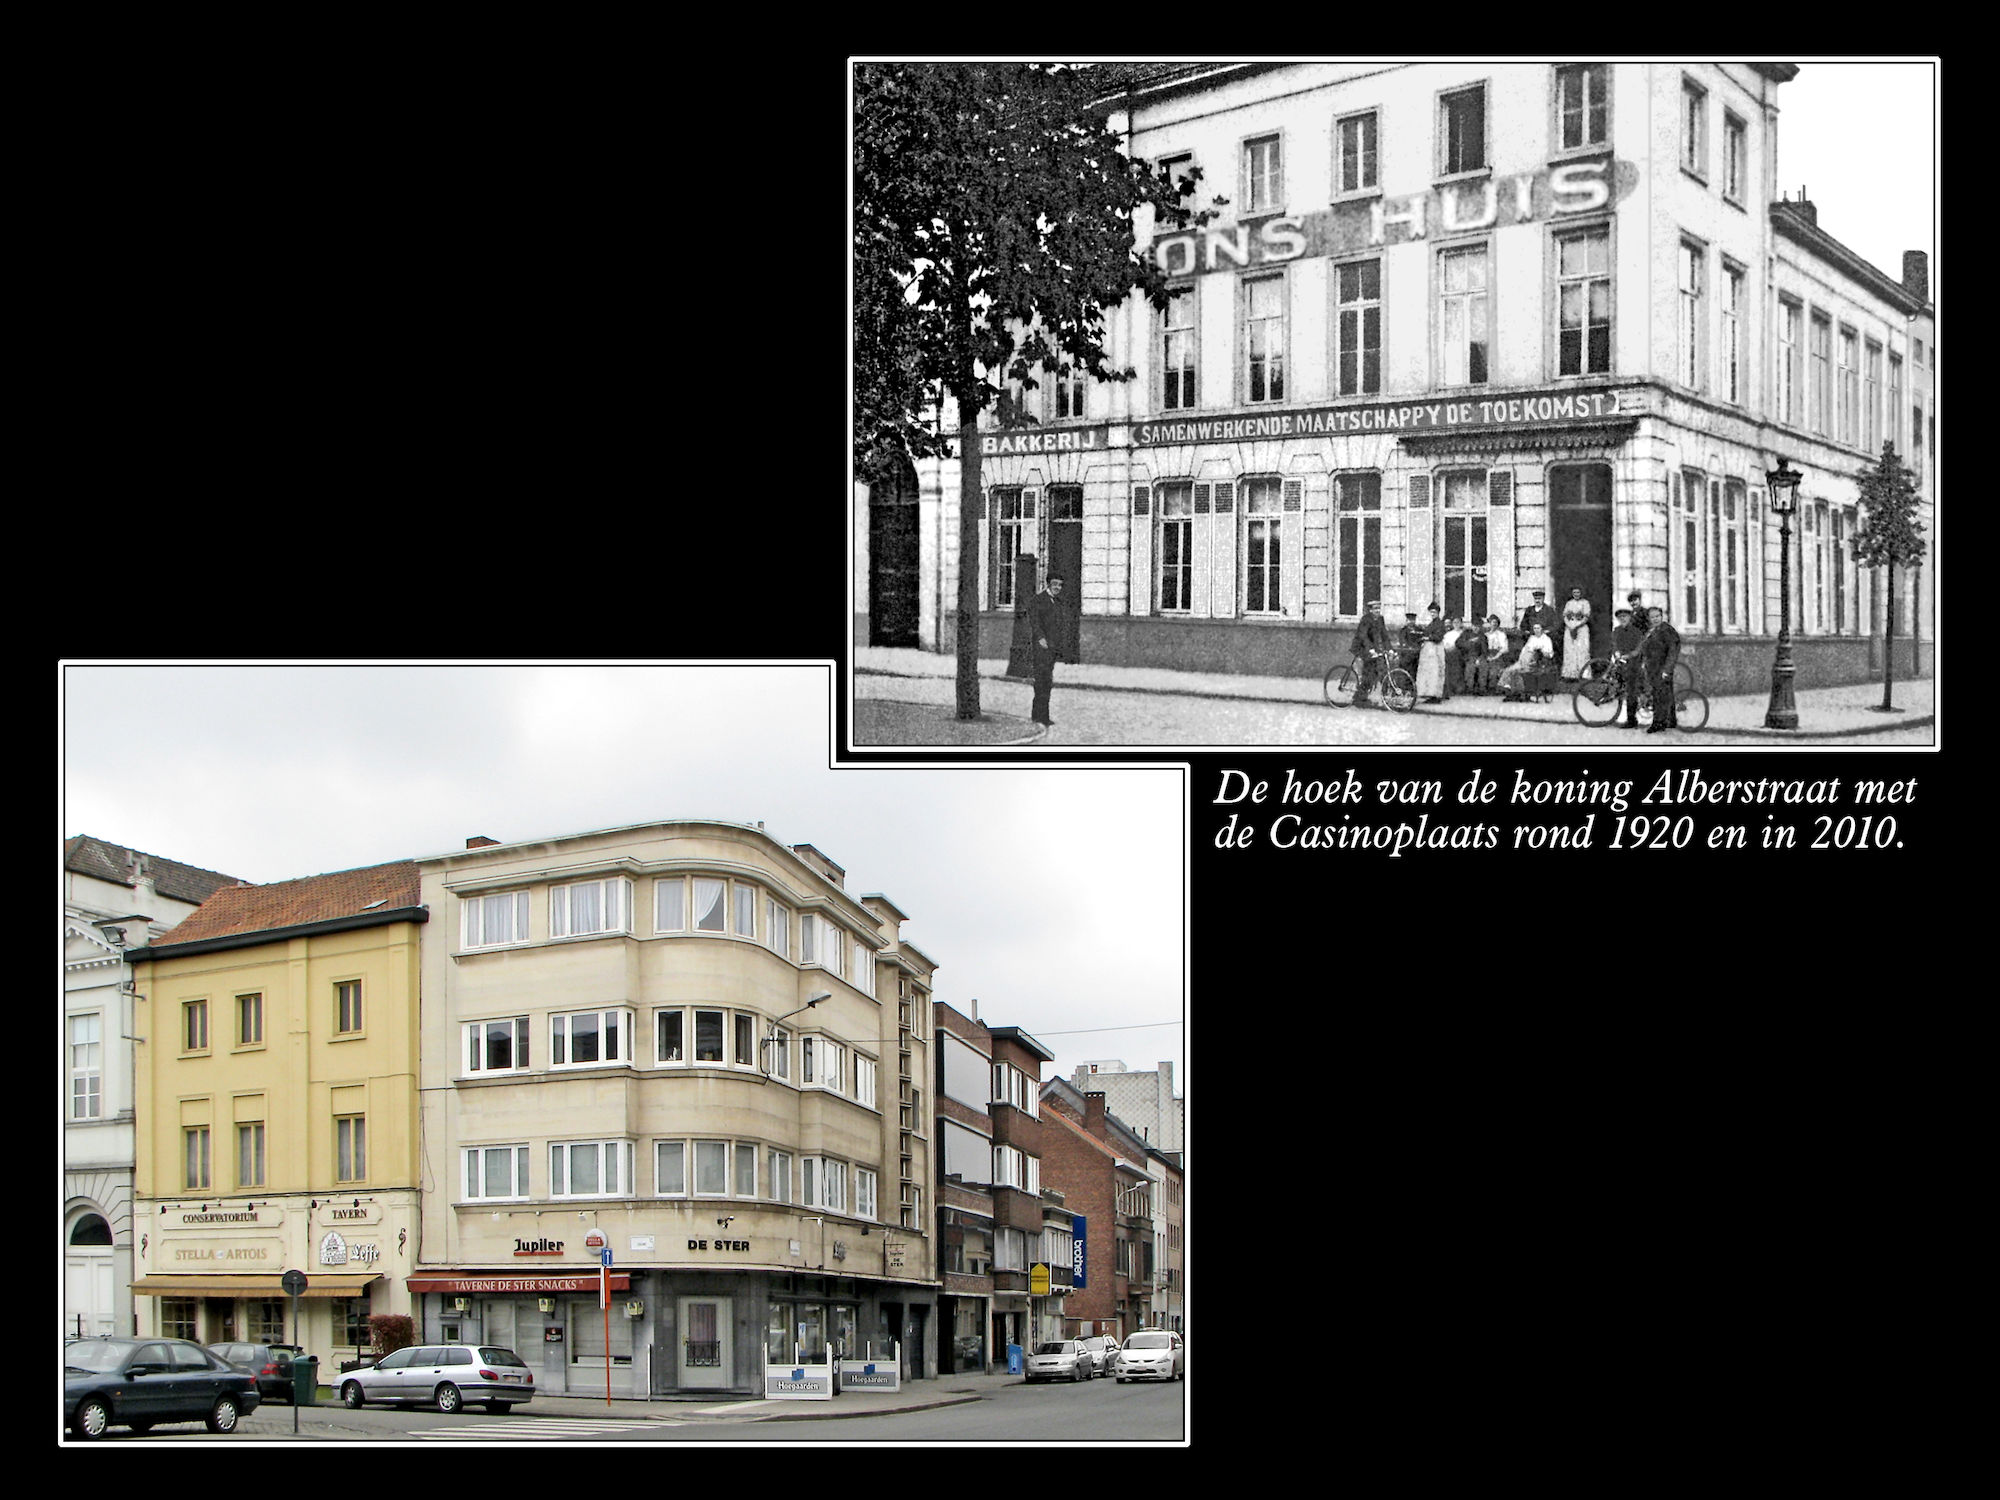 Koning Albertstraat ca 1920 en  2010